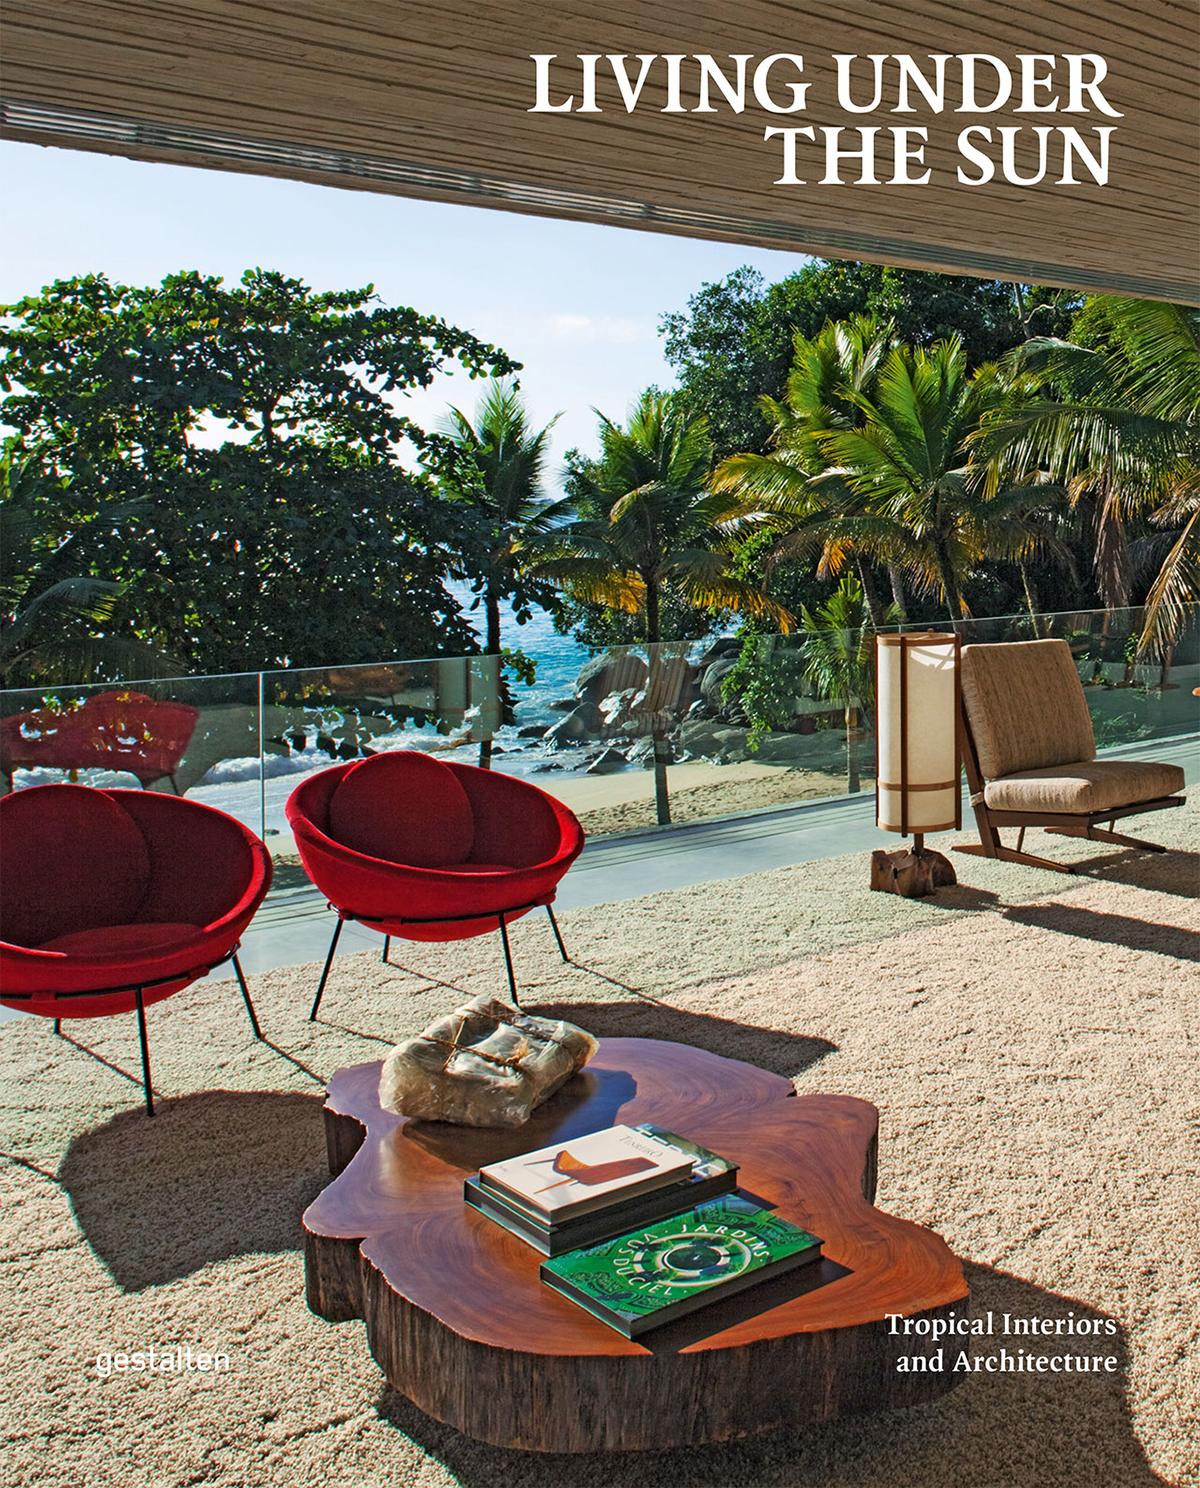 s2_living_under_the_sun_gestalten_book_cover_yatzer_0